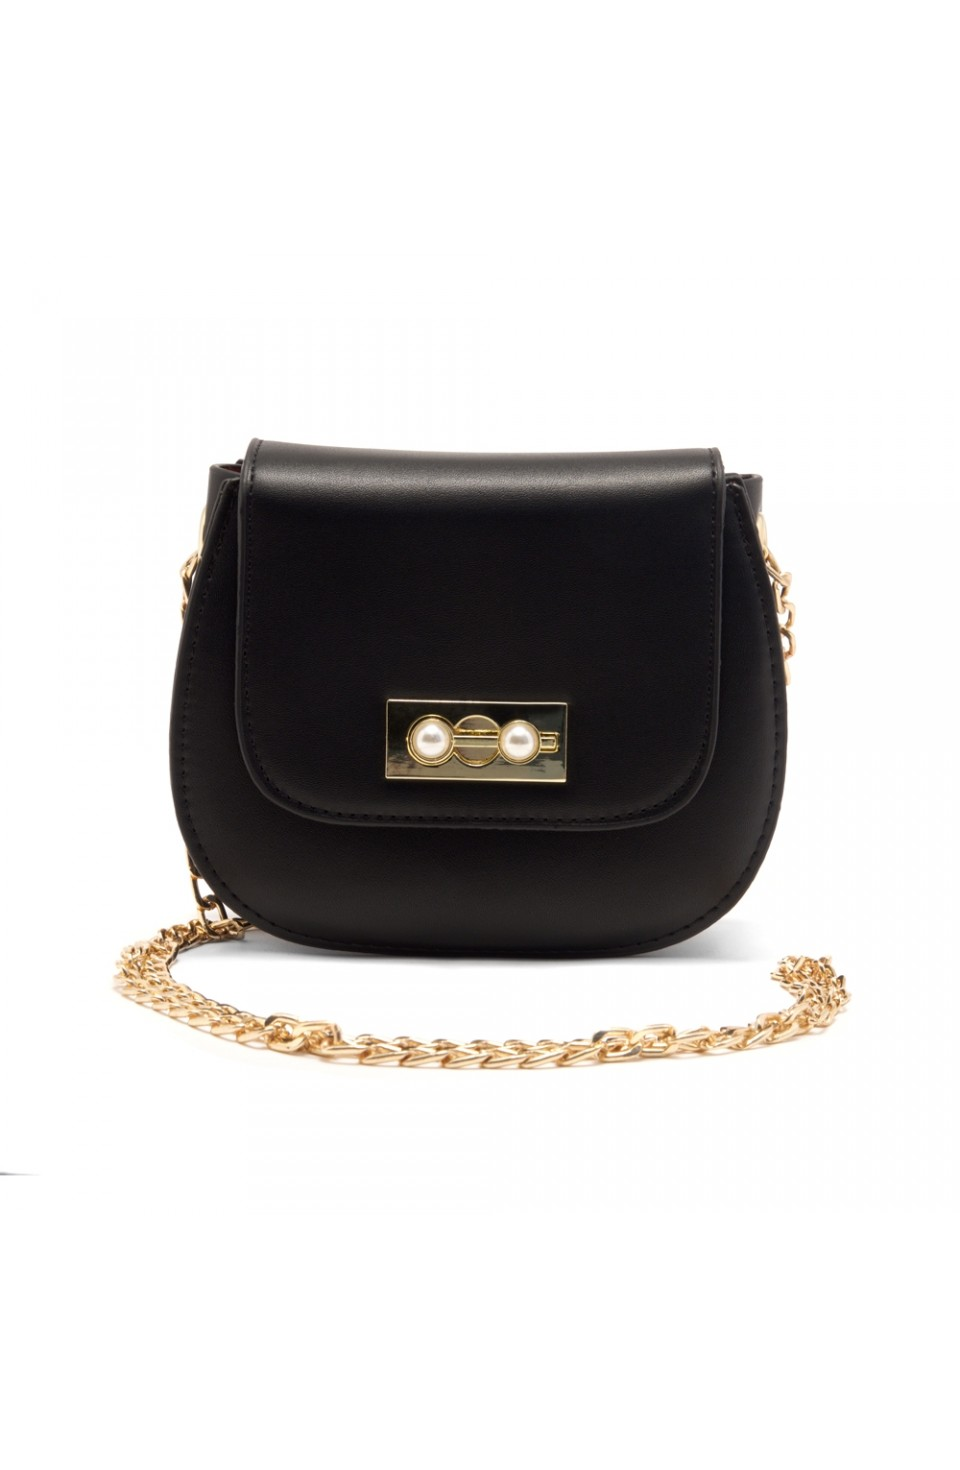 SZ17-LH2-16581 - Women's Fashion Design Mini Crossbody Bag (Black)